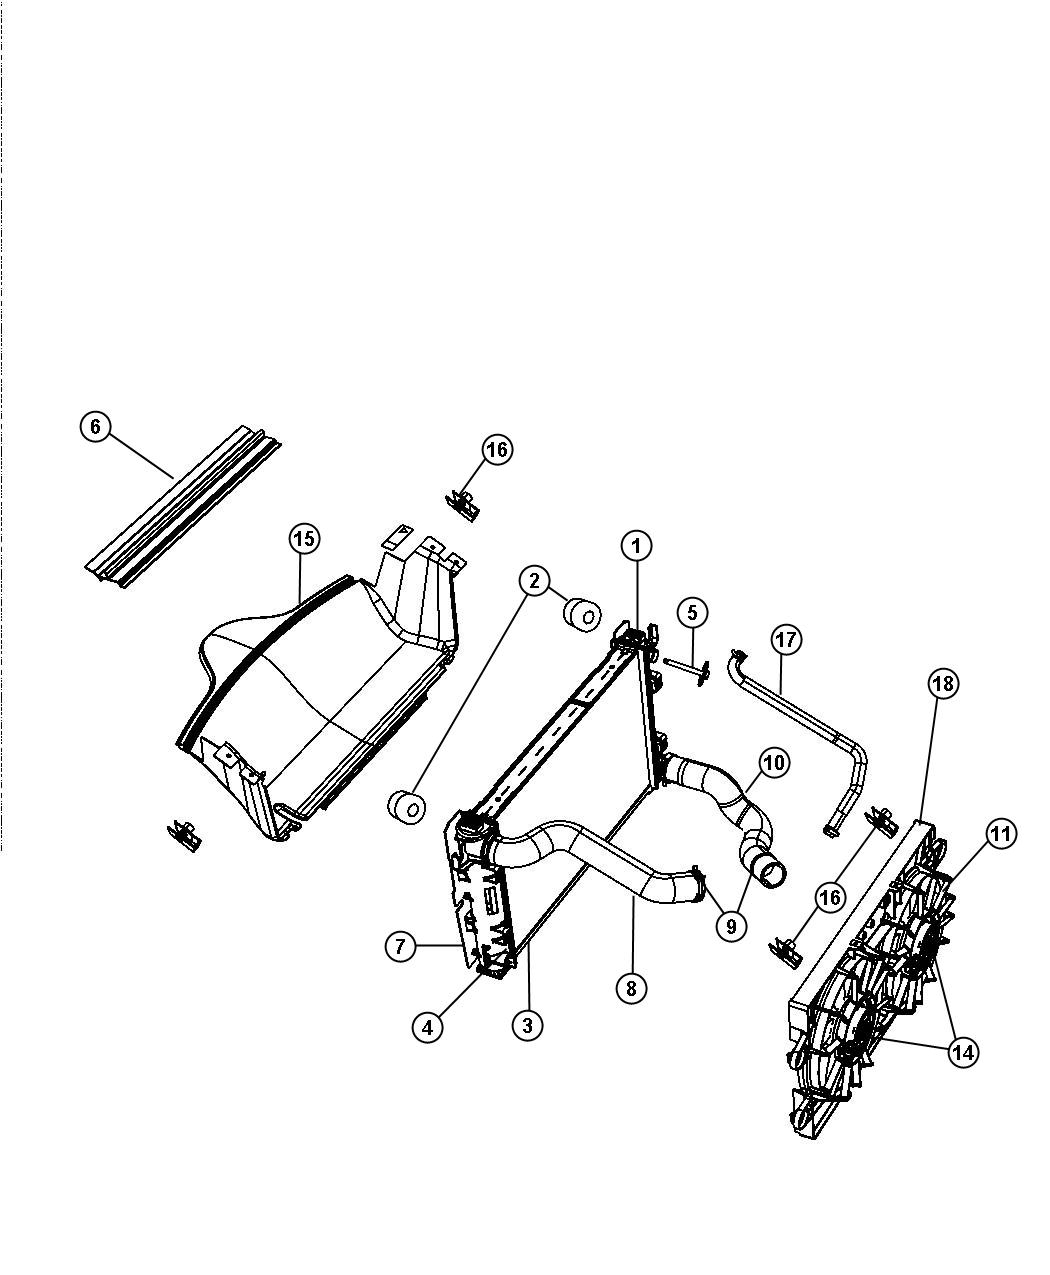 2012 Dodge Durango Seal. Radiator upper. Related